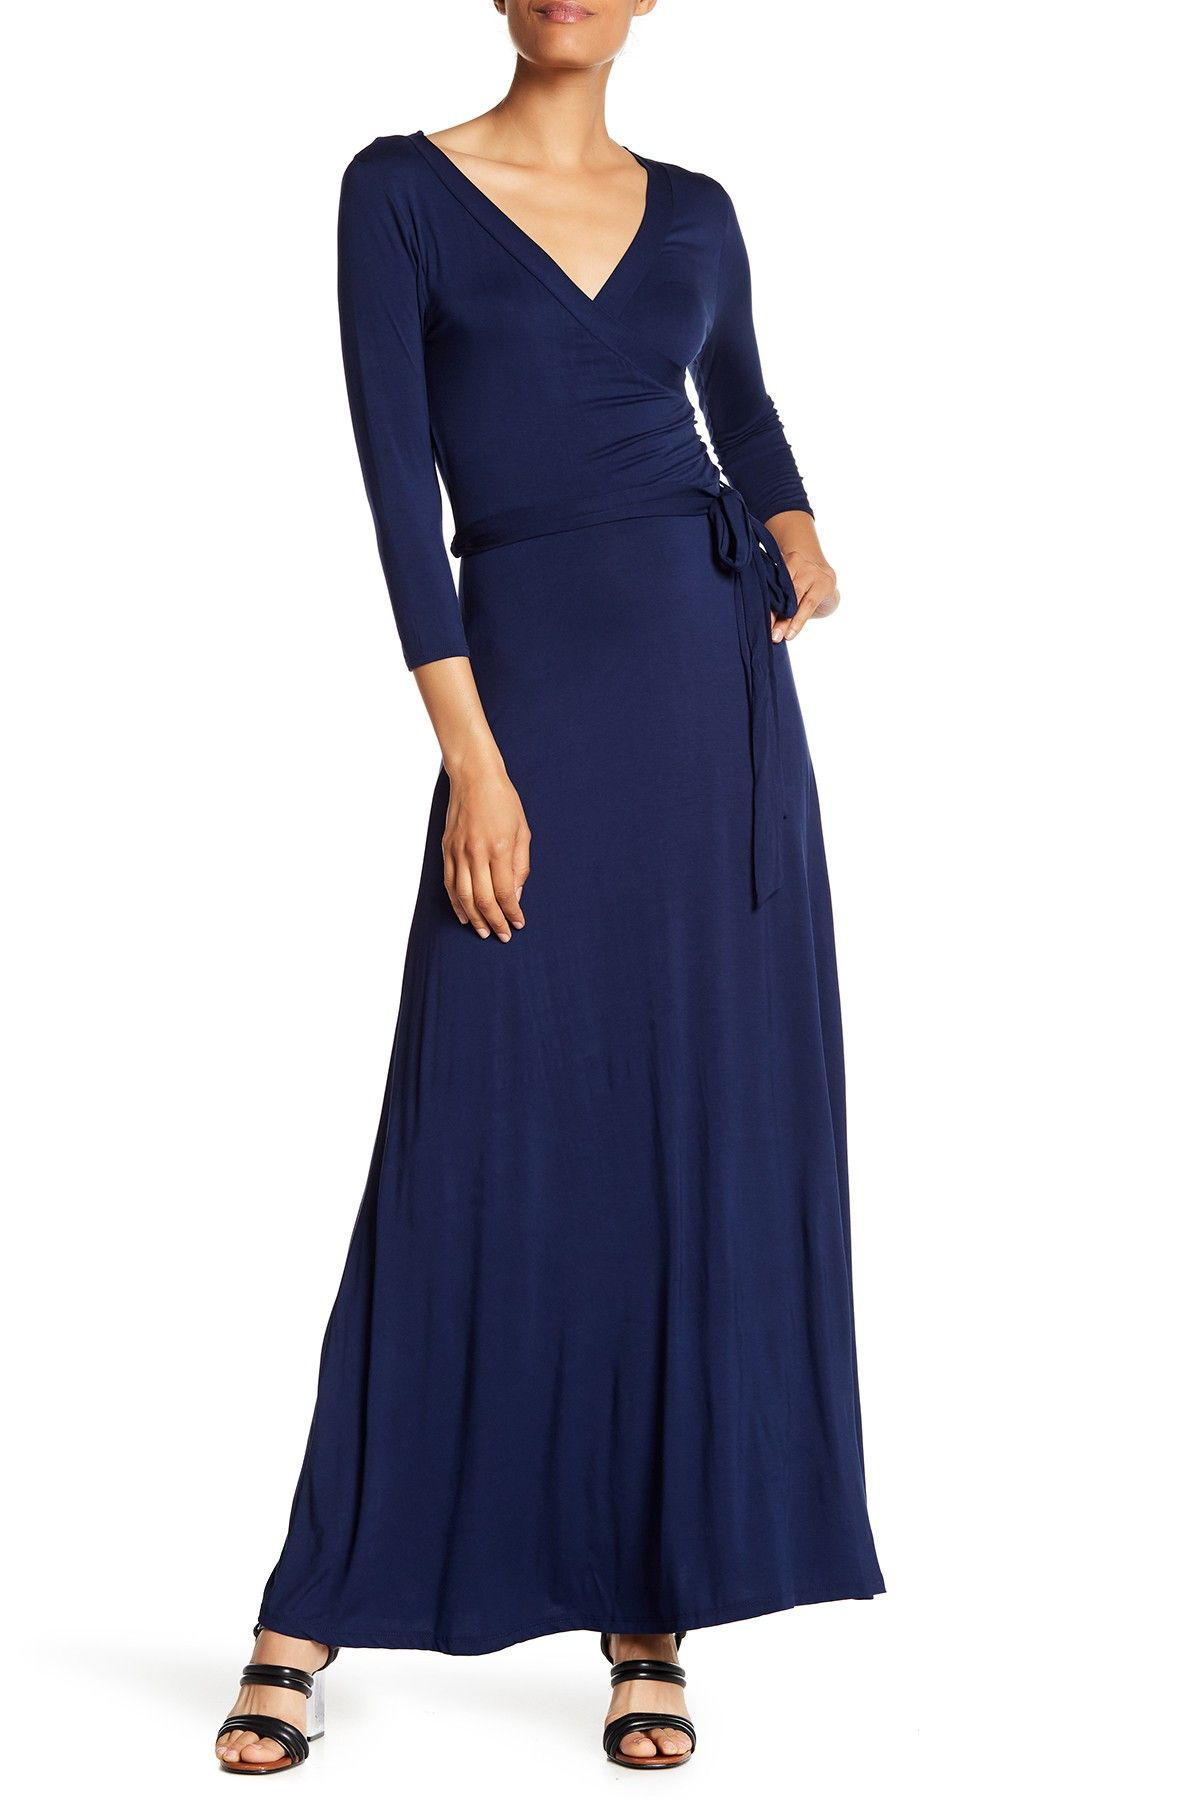 West Kei Solid Woven 3 4 Length Sleeve Dress Hautelook Dresses Nordstrom Dresses Navy Blue Maxi Dress [ 1800 x 1200 Pixel ]